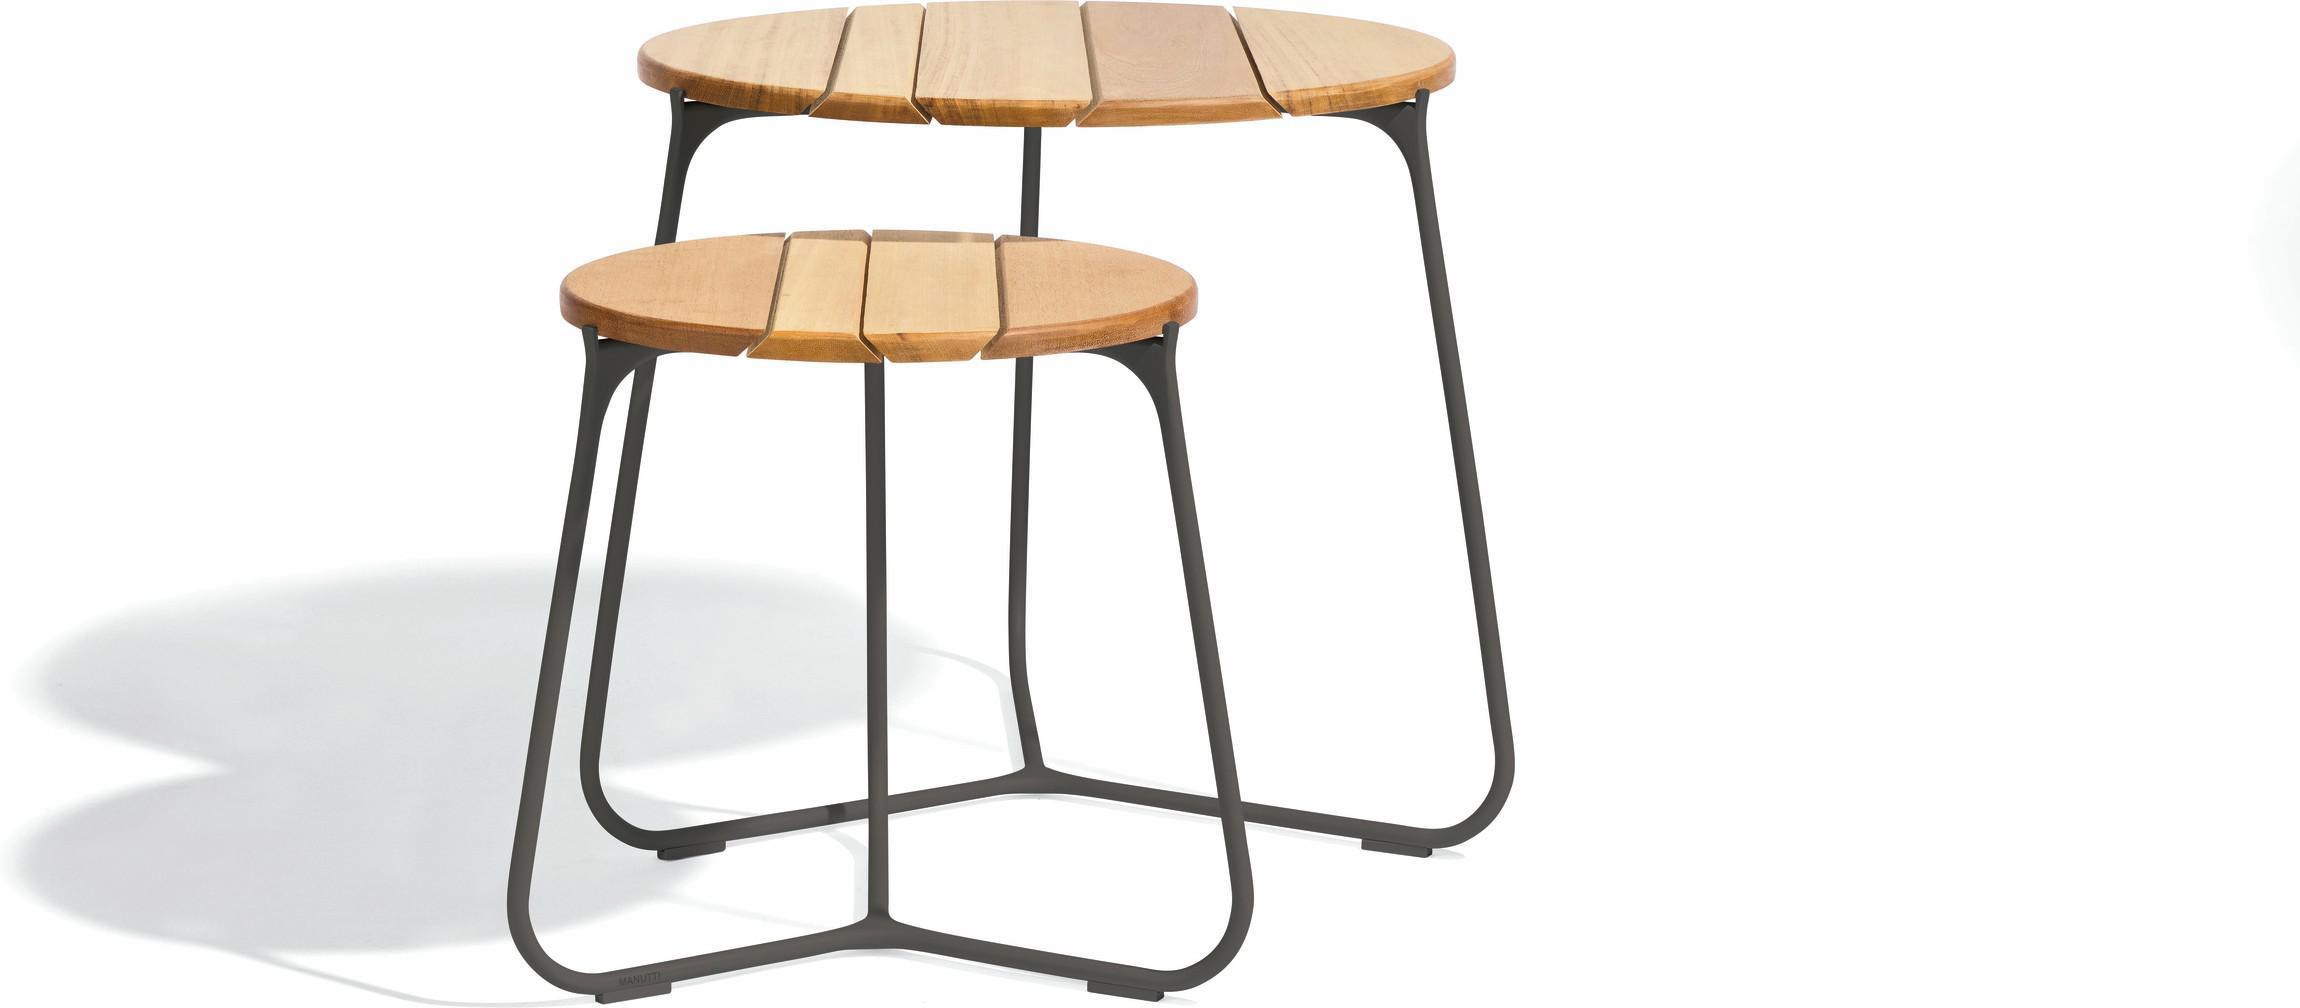 Mood coffee table - lava - iroko IR - 60